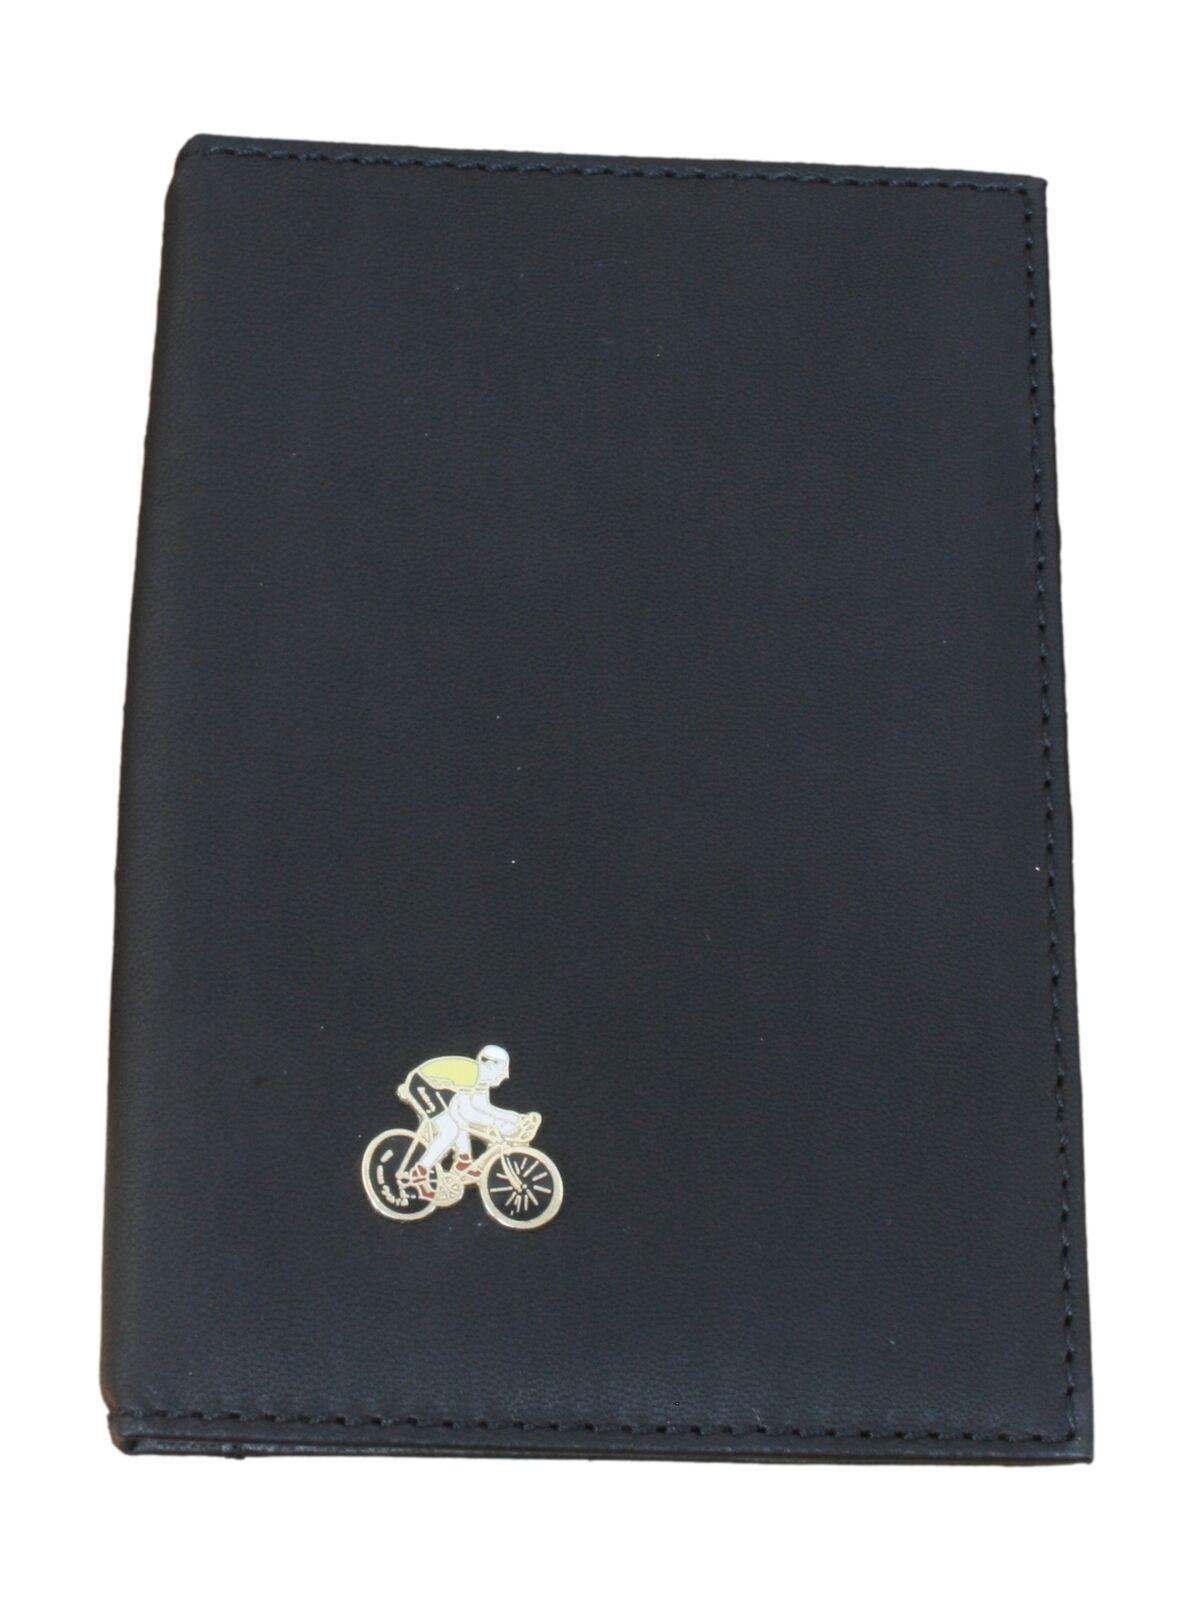 Cyclist Enamel Black Leather Shotgun/Firearms Certificate Holder 96